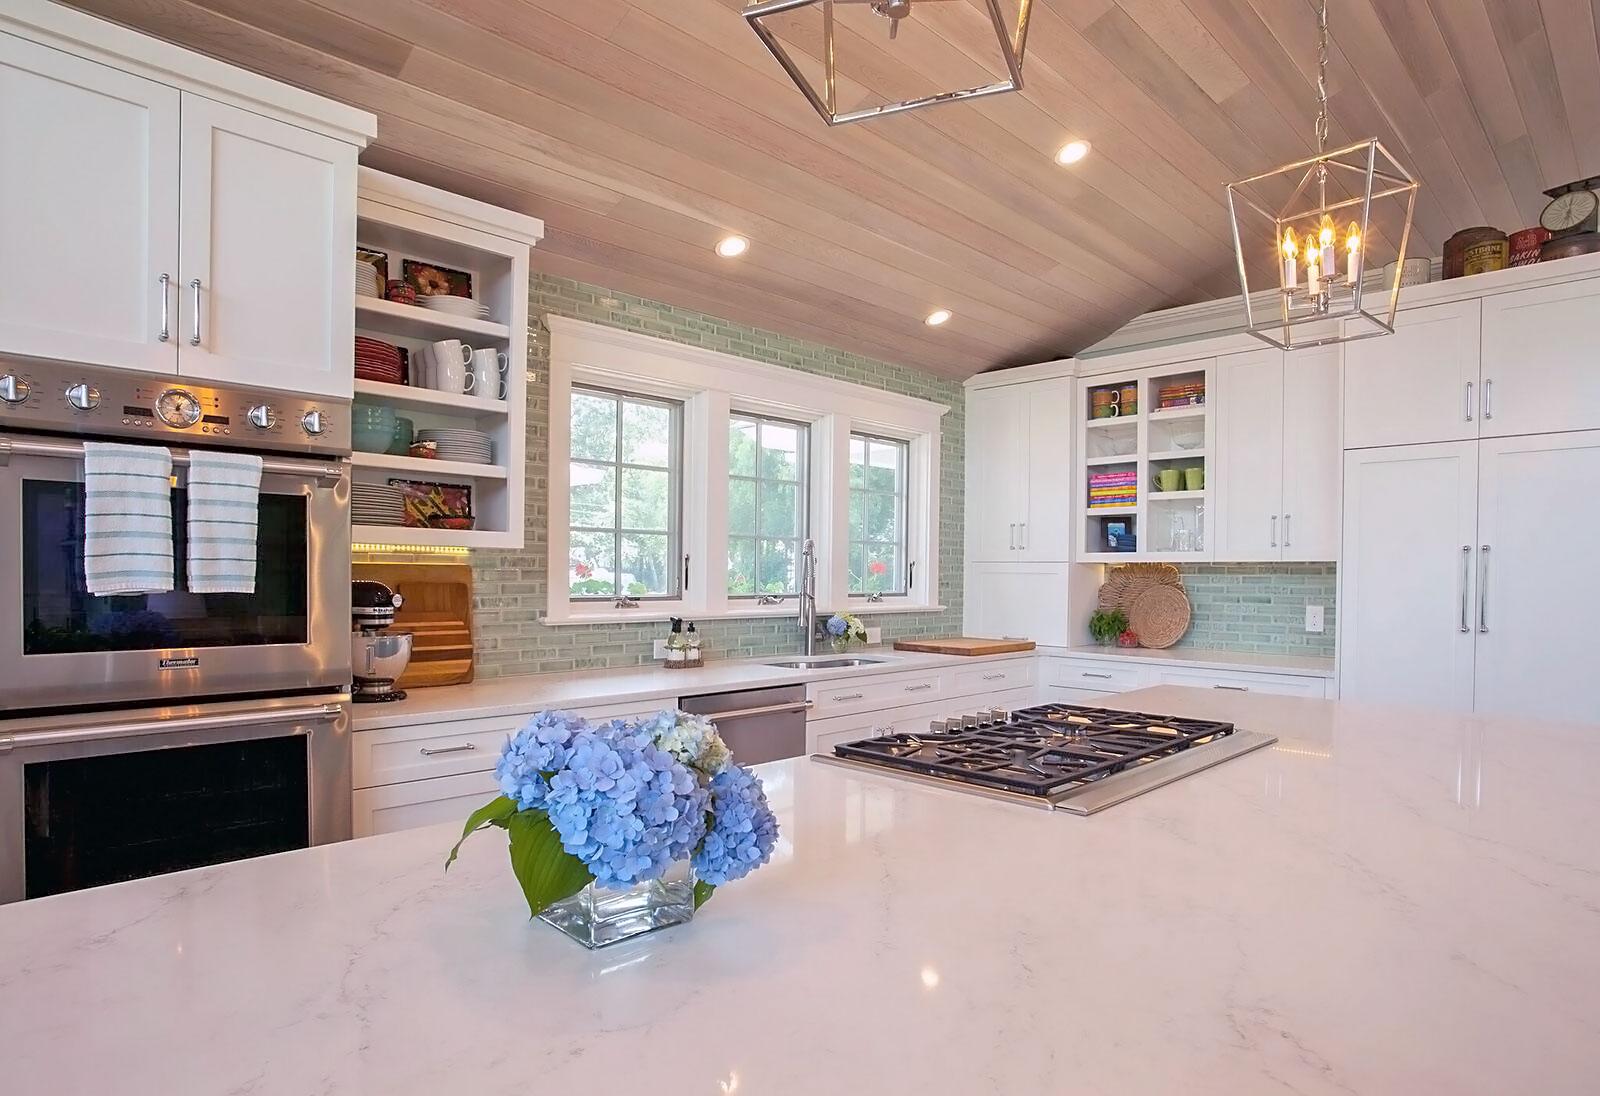 Stephen-Sullivan-Inc-Custom-Home-Builders-Rhode-Island-Narrow-River-Cottage---15